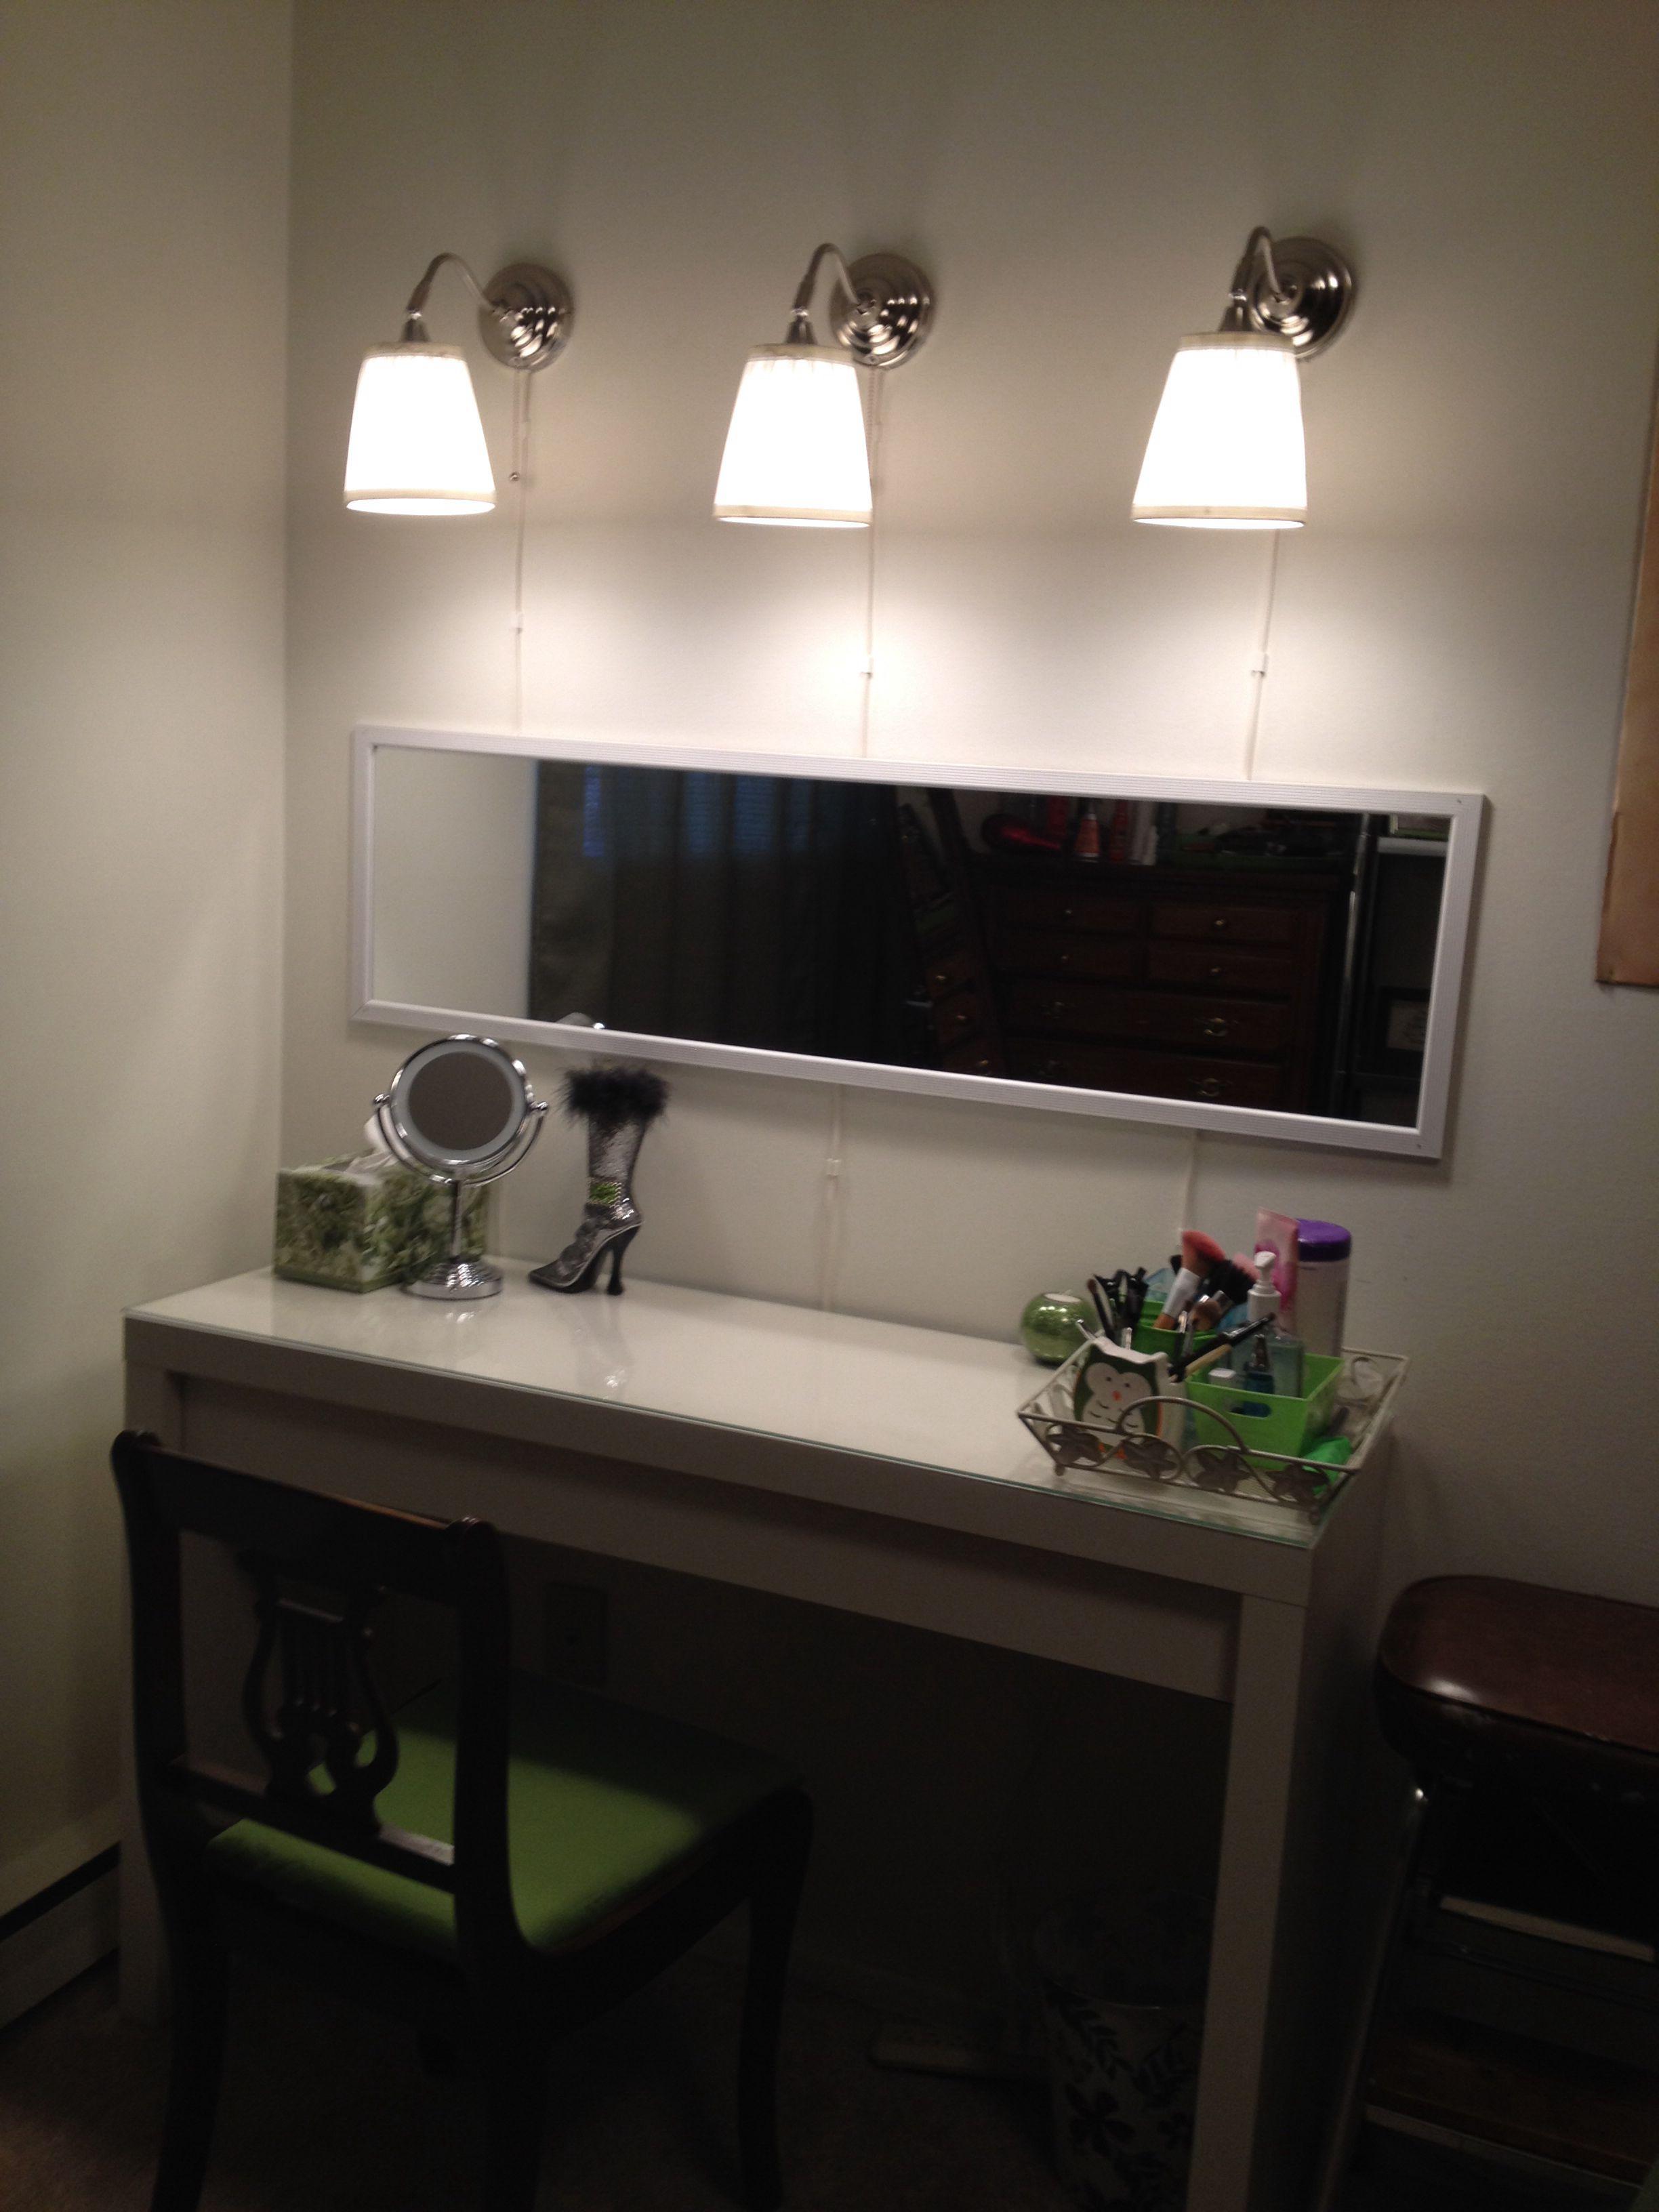 Ikea Vanity Malm Dressing Table And Arstid Wall Lamps Wandlampe Zimmer Badezimmer